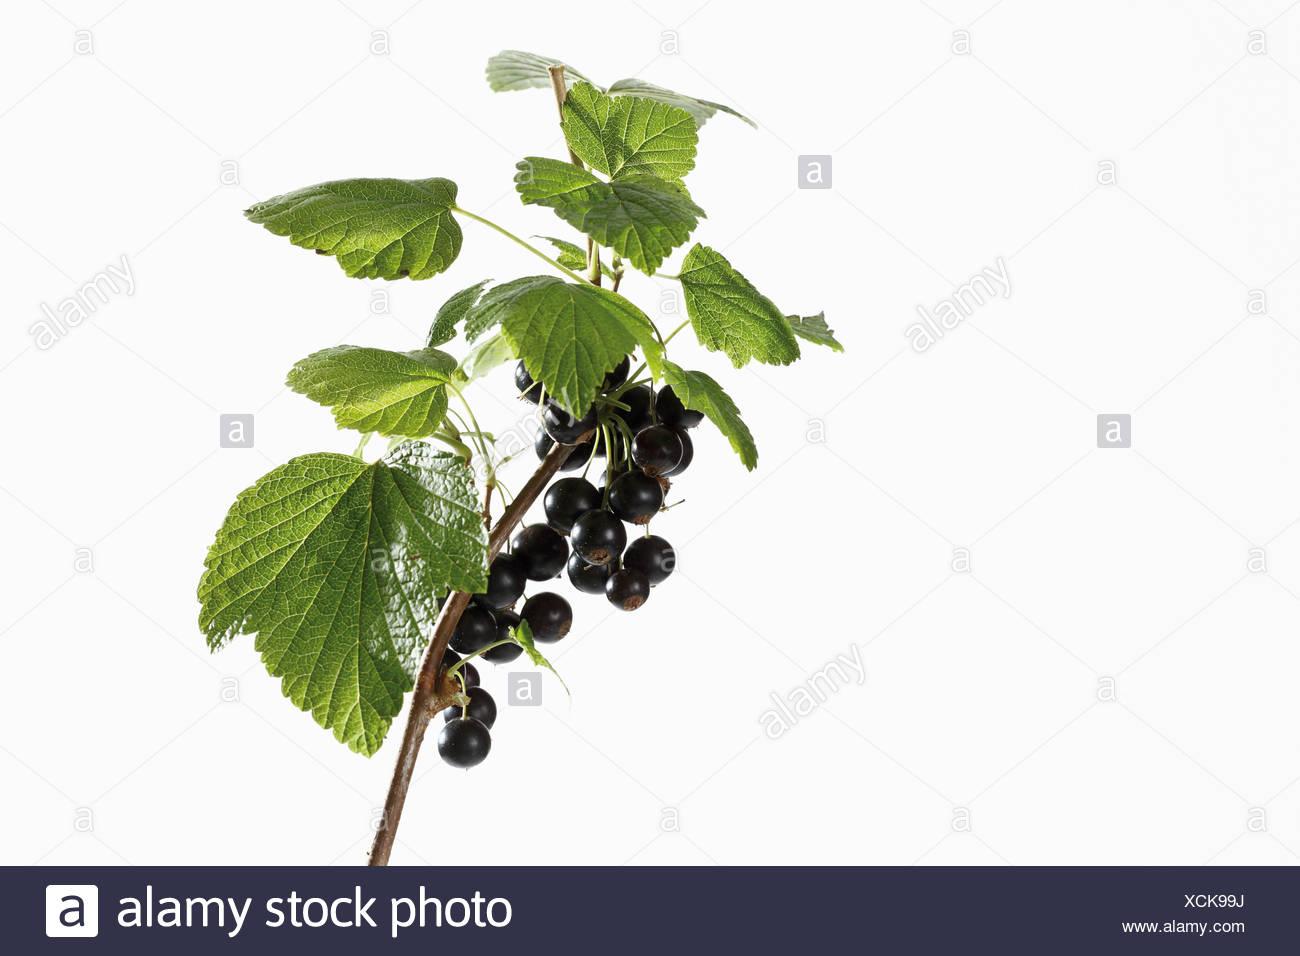 Black currants (Ribes nigrum) on branch Stock Photo